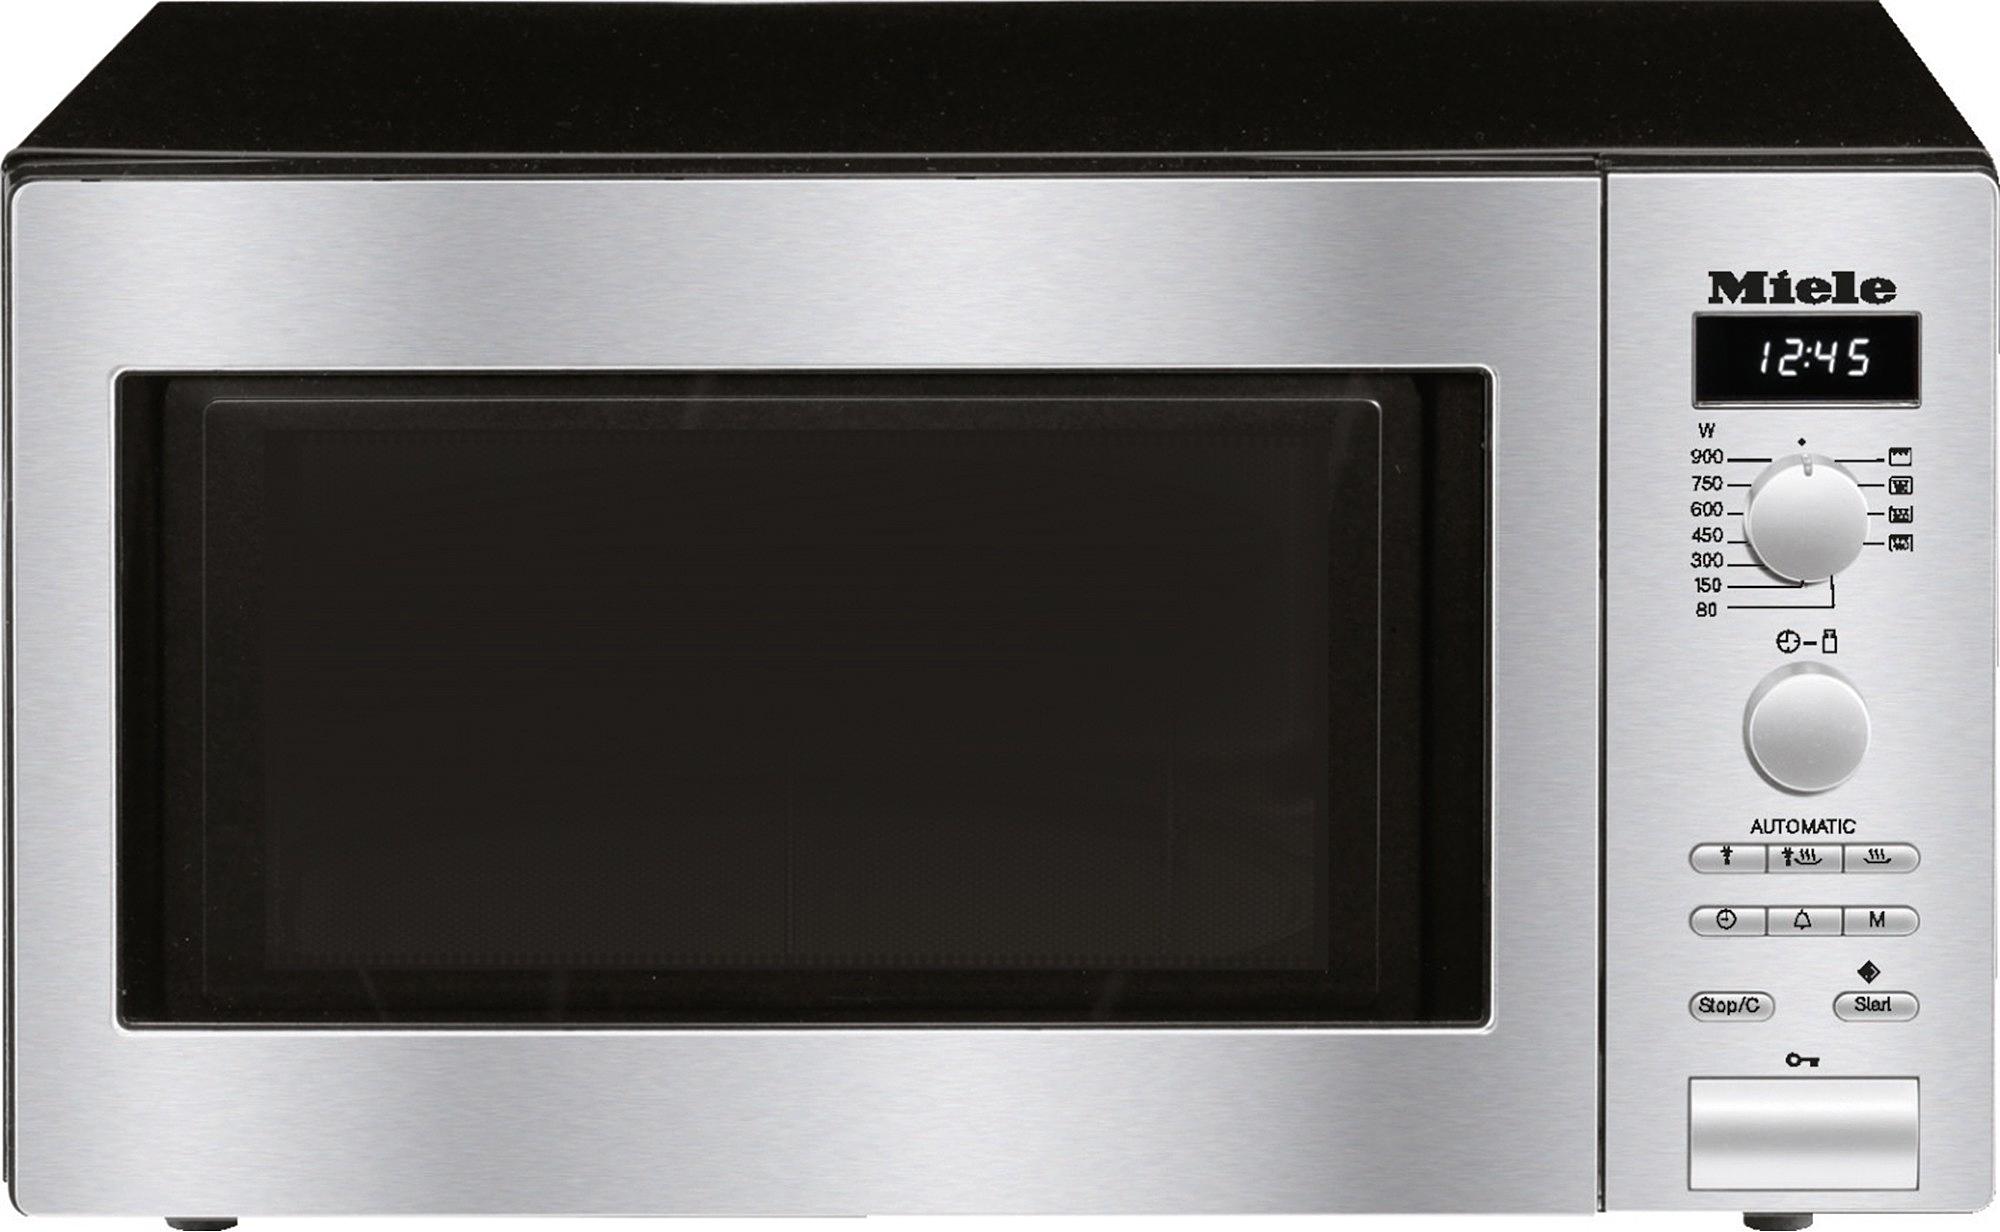 Uncategorized Miele Kitchen Appliances Reviews device squad jargon free gadget and consumer product reviews aeg m 6012 microwave appliancebest review kitchen